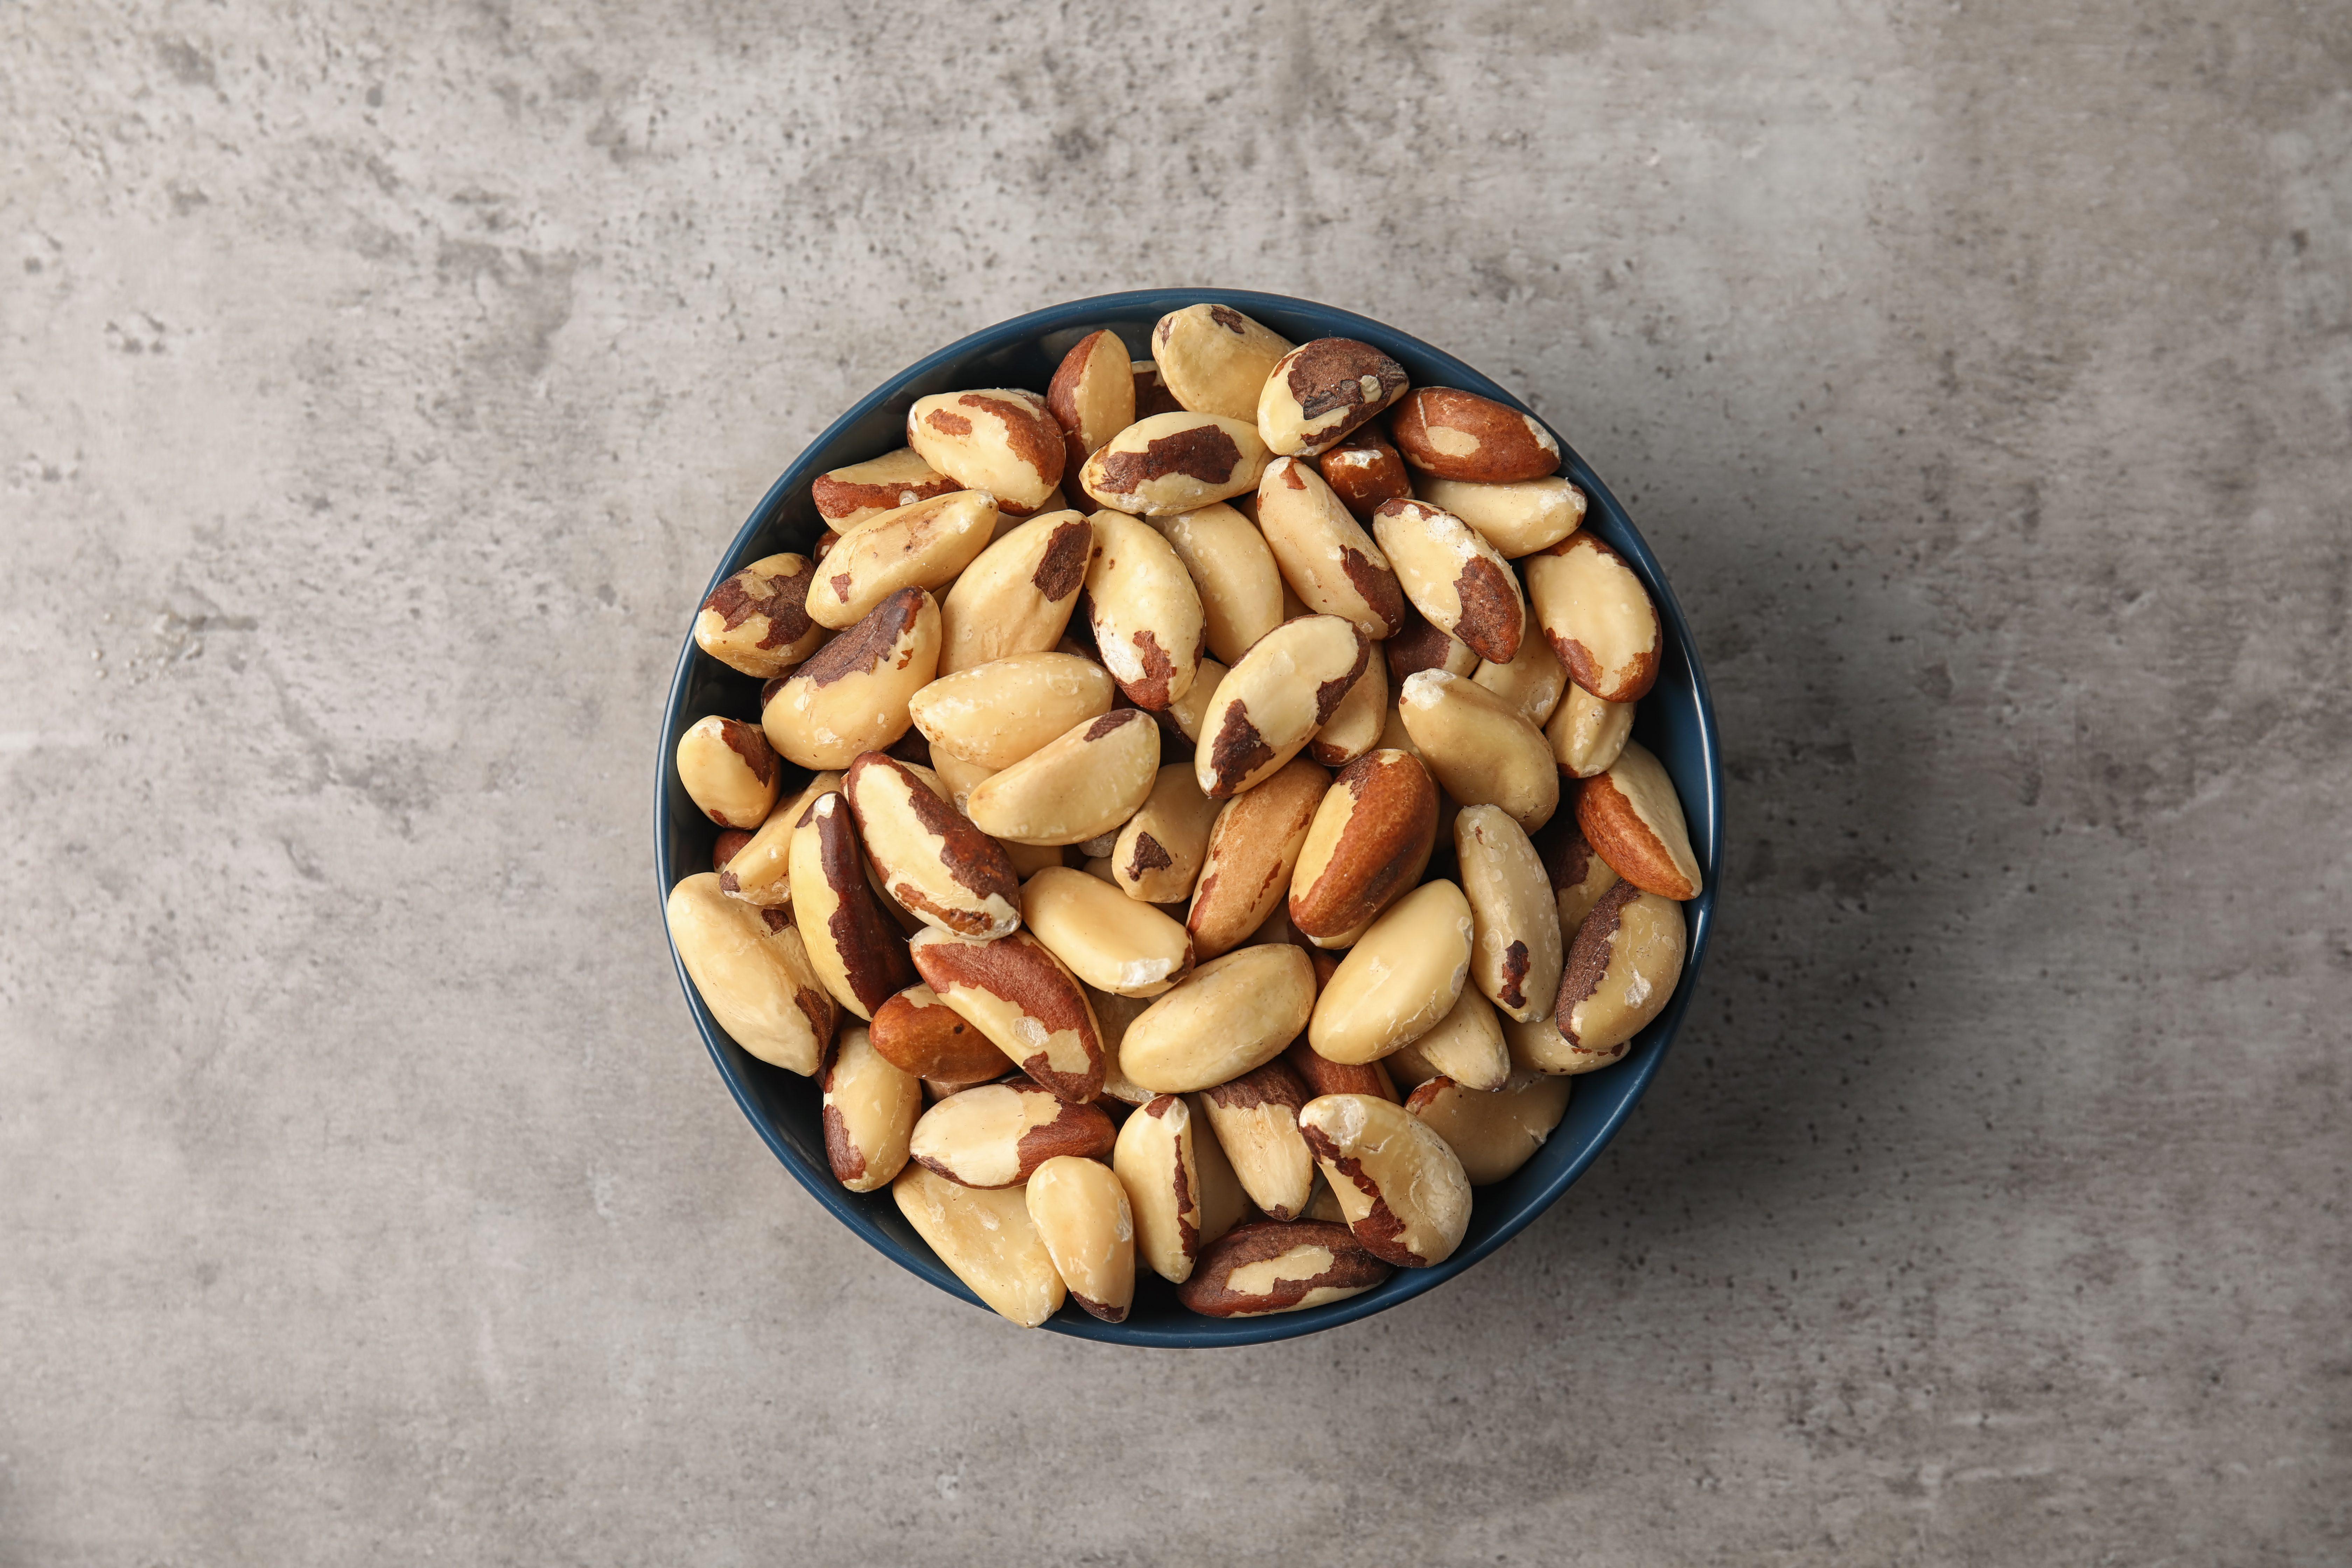 Blue bowl full of shelled Brazil nuts